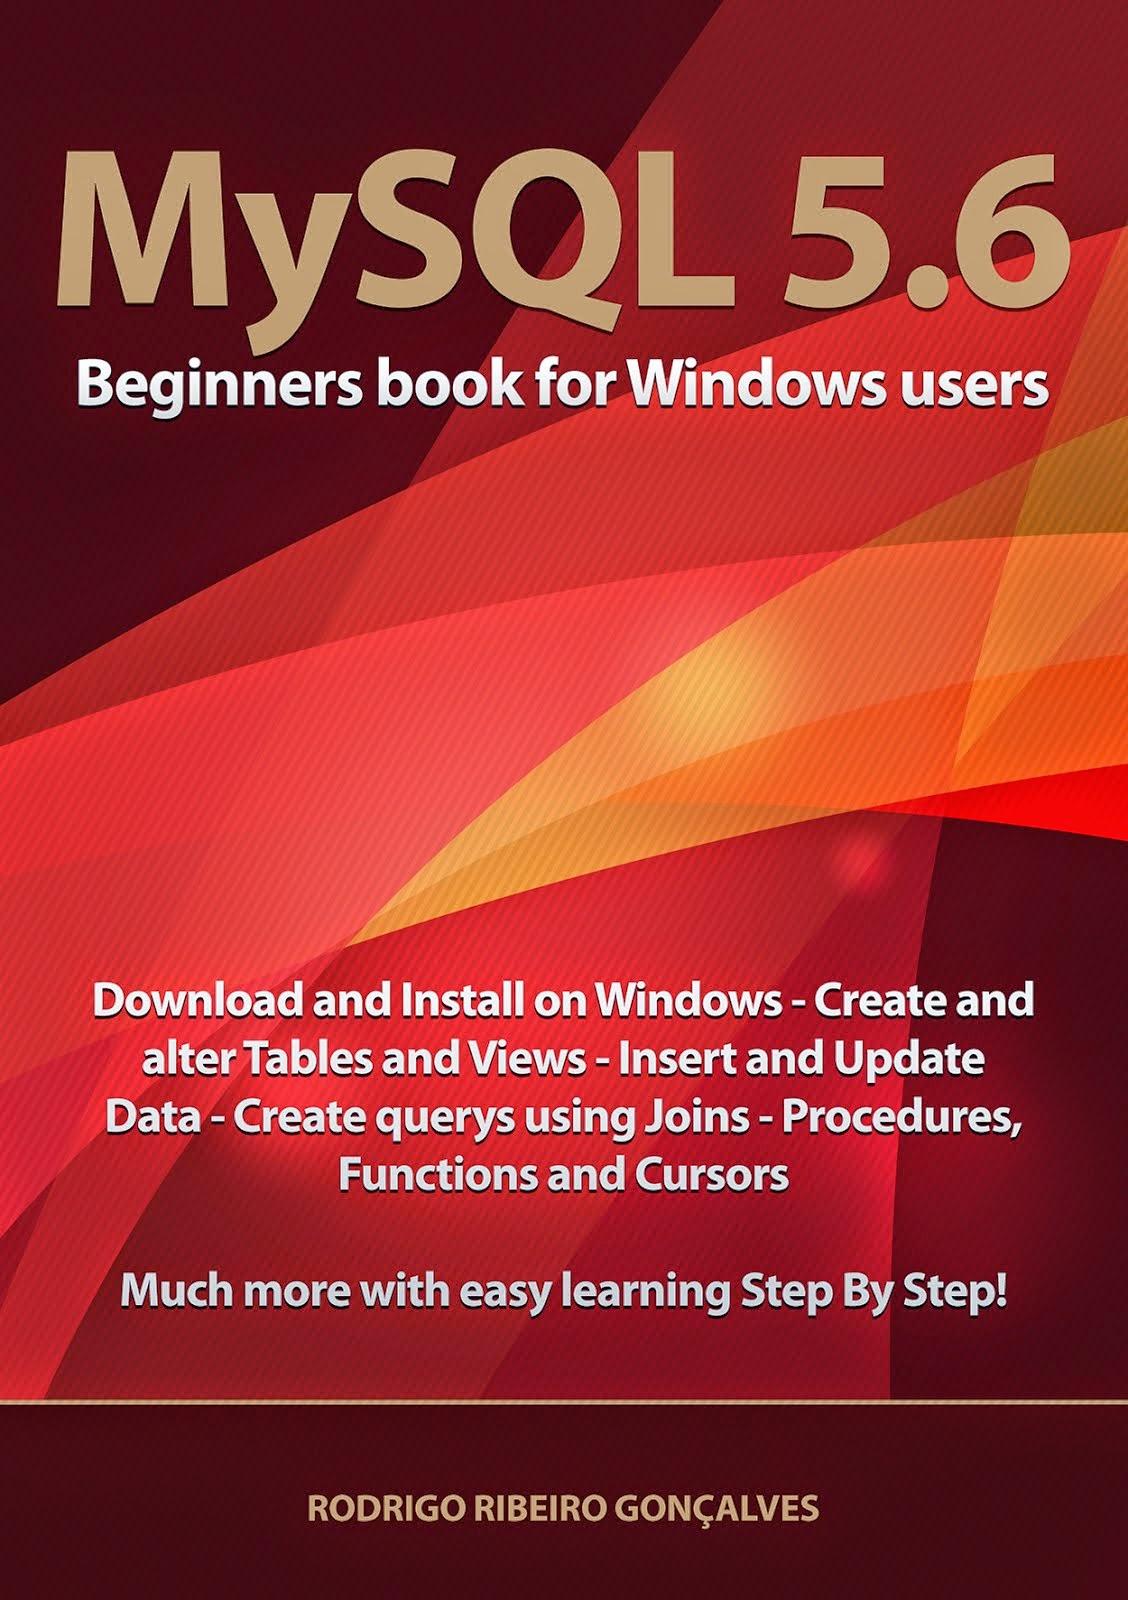 MySQL 5.6 - Beginners Book